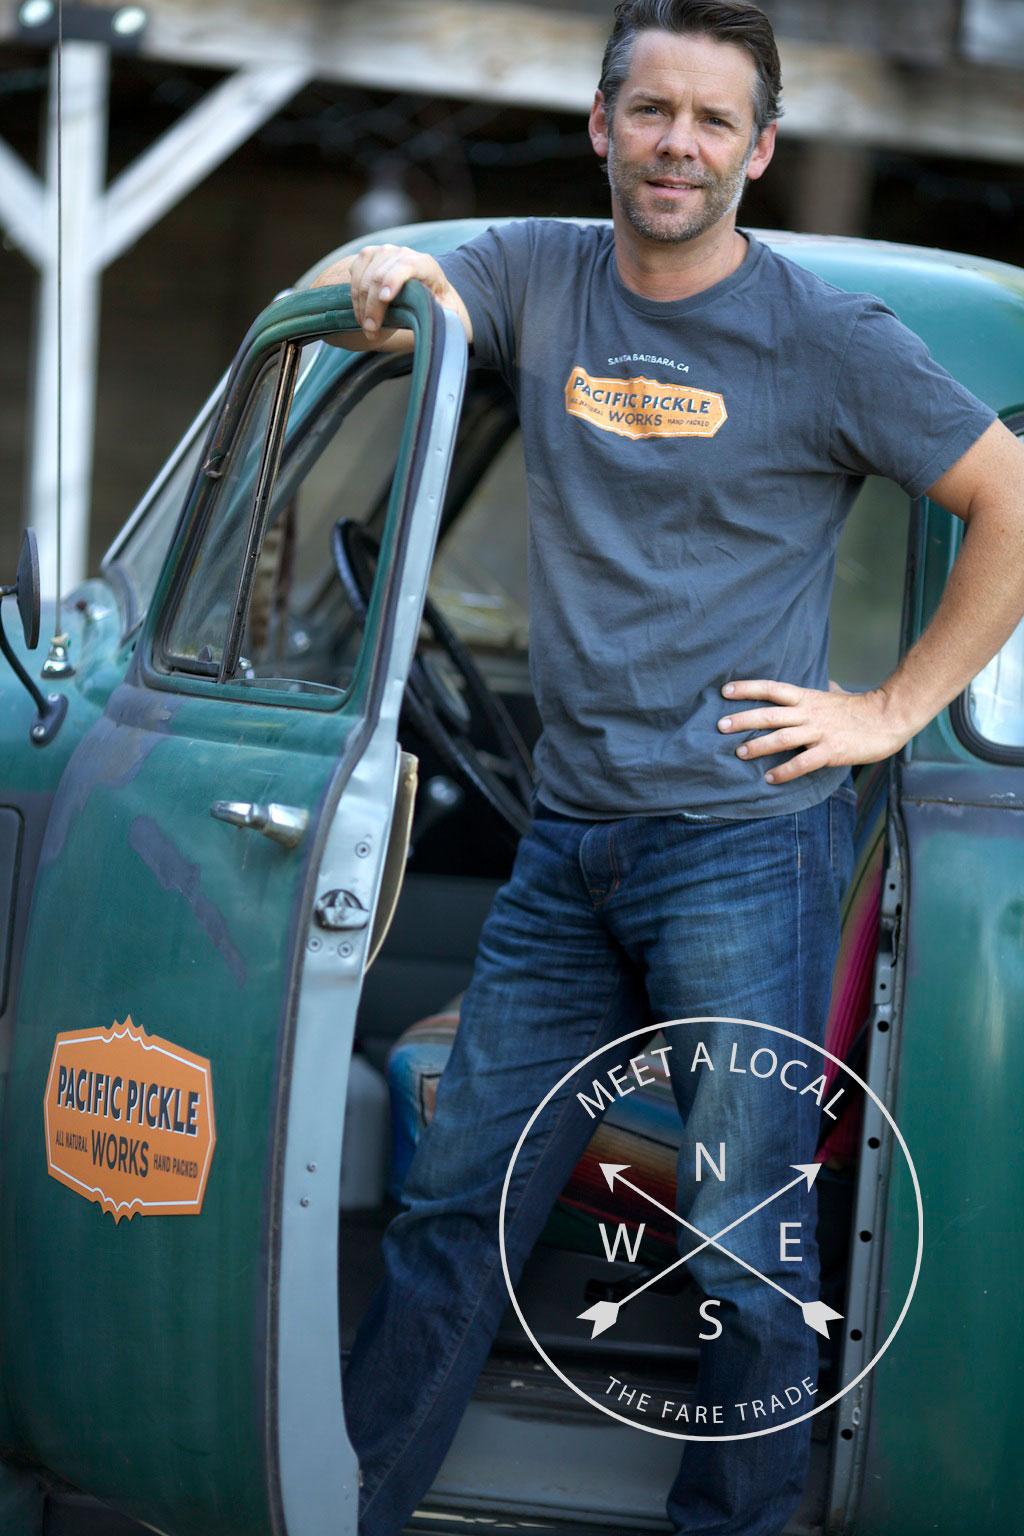 Bradley Bennett | Pacific Pickle Works